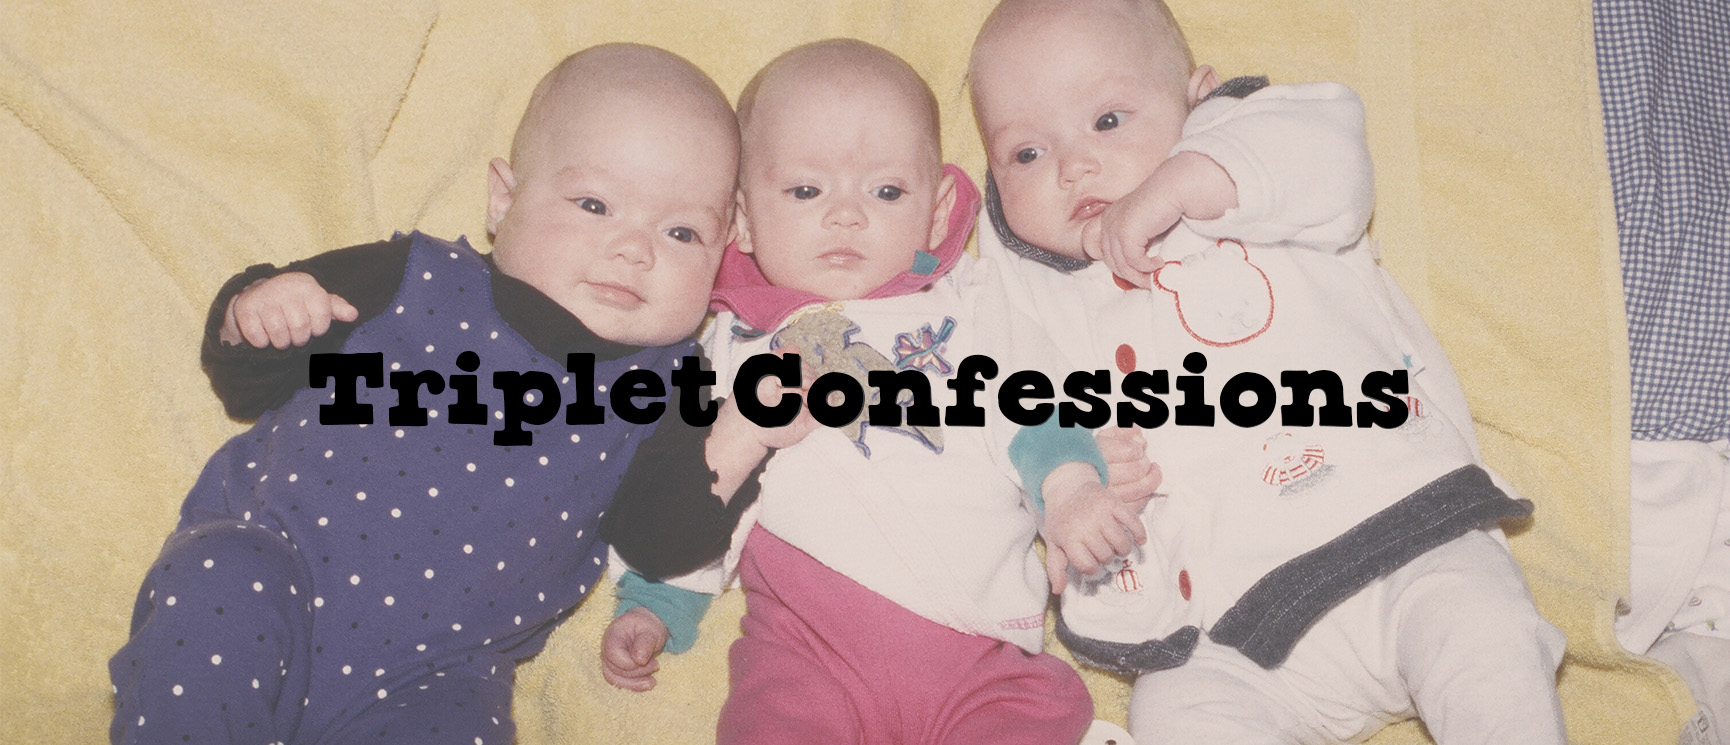 confessions header copy.jpg